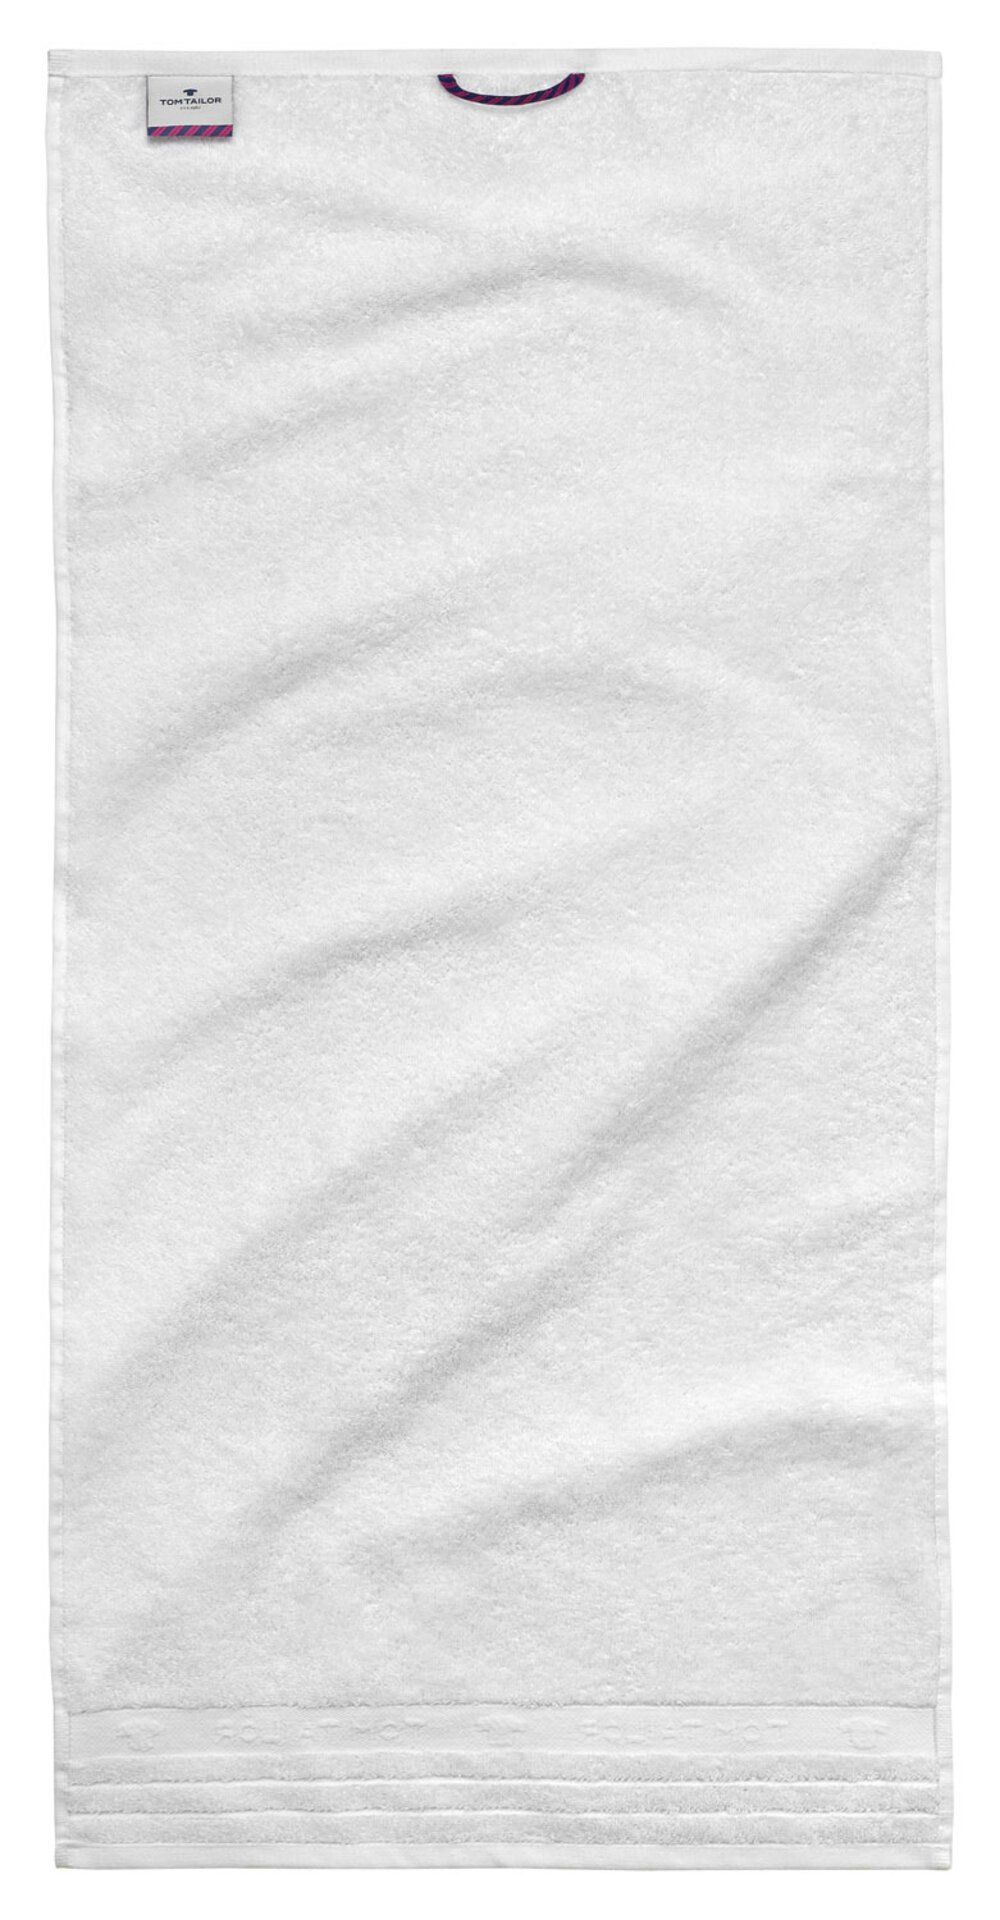 Gästetuch Uni Towel Tom Tailor Textil weiß 30 x 50 cm